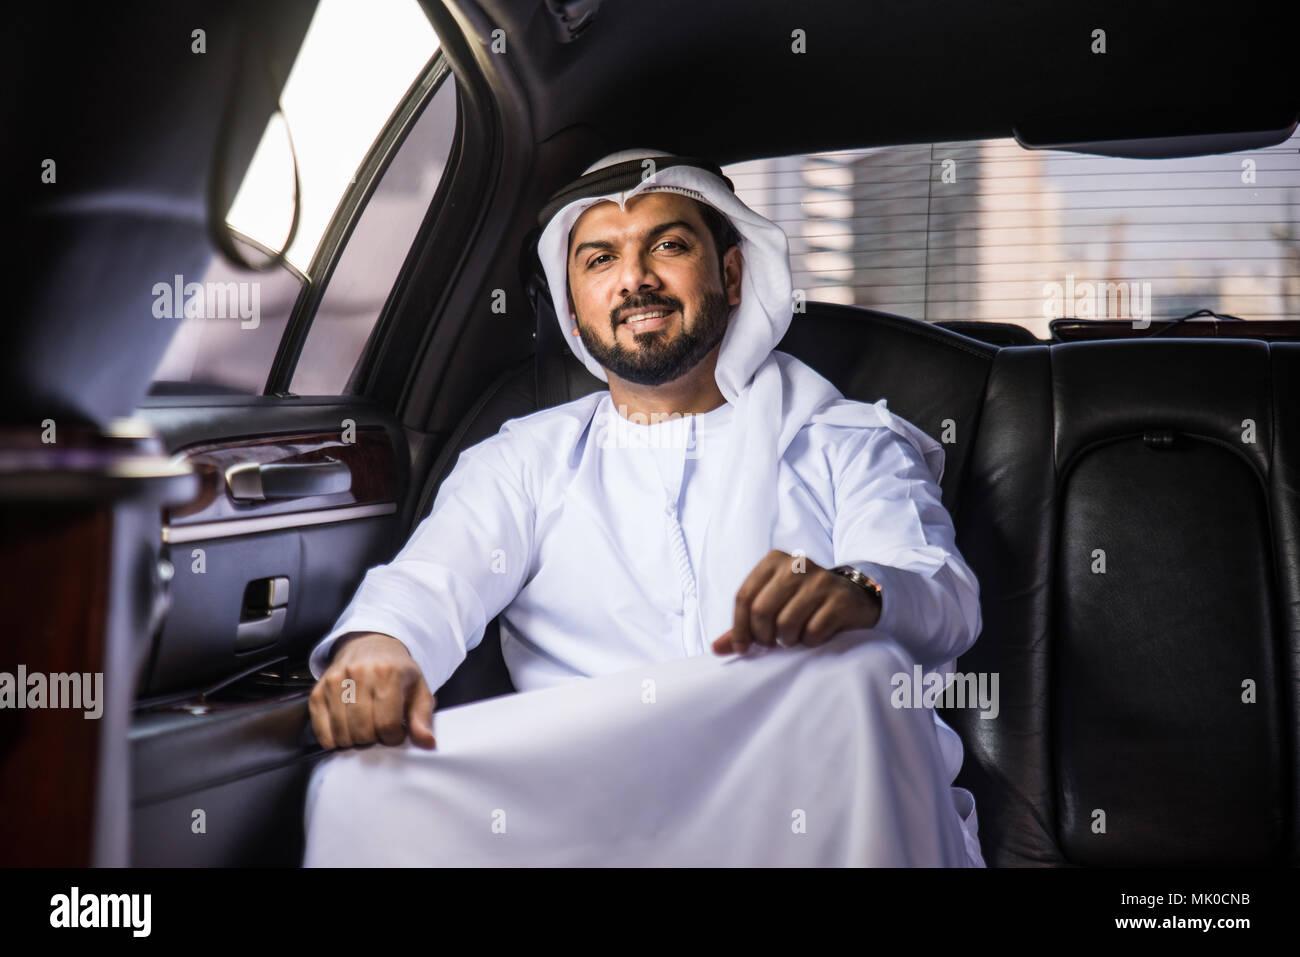 Arabic businessman wearing kandora - Portrait of traditional emirati man Stock Photo